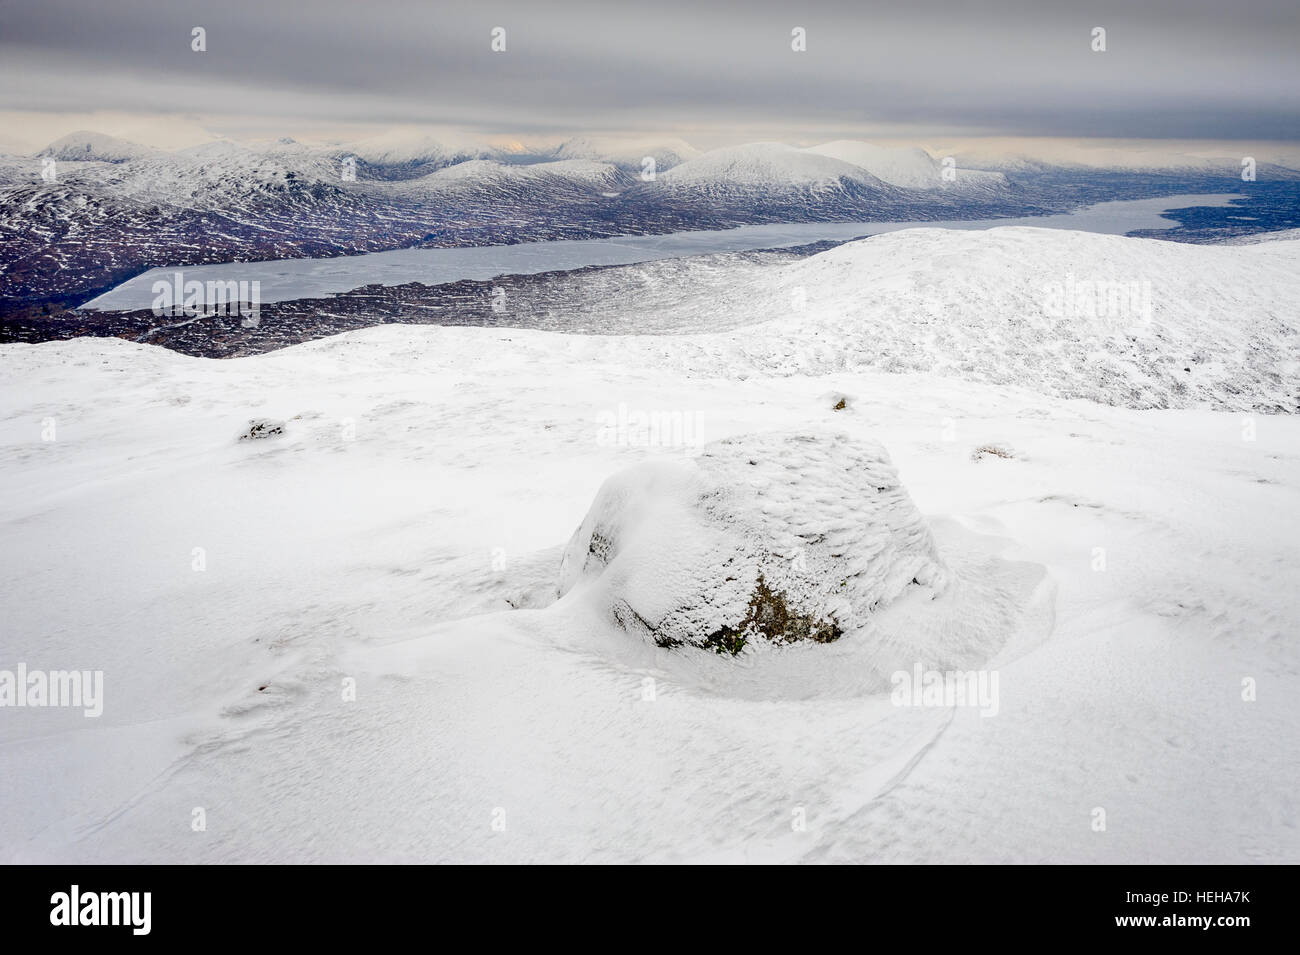 Highland Winter - Stock Image